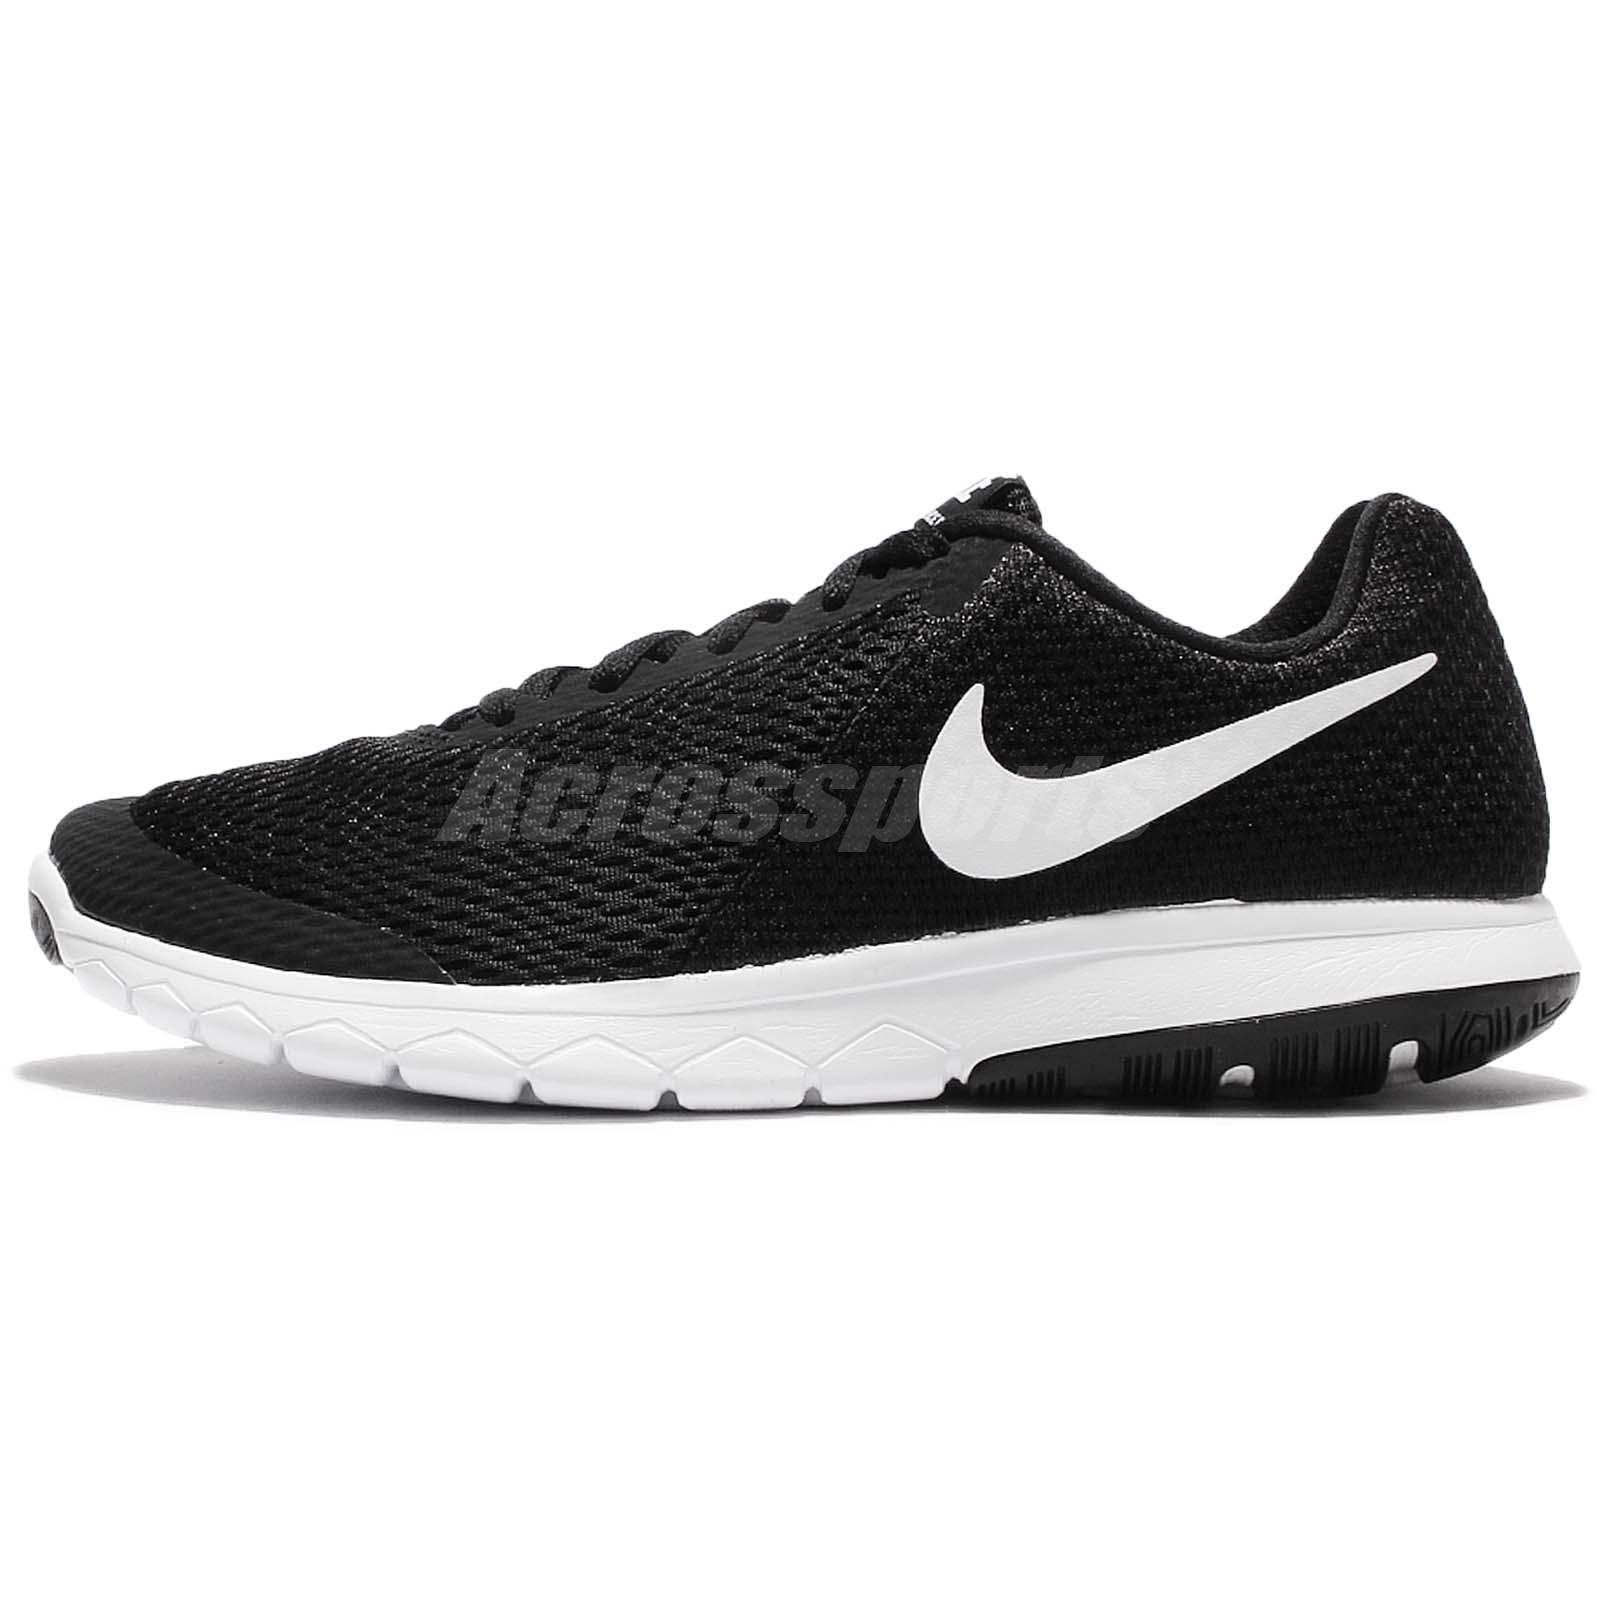 Wmns Nike Flex Experience RN 6 VI Black White Women Running Shoes 881805001